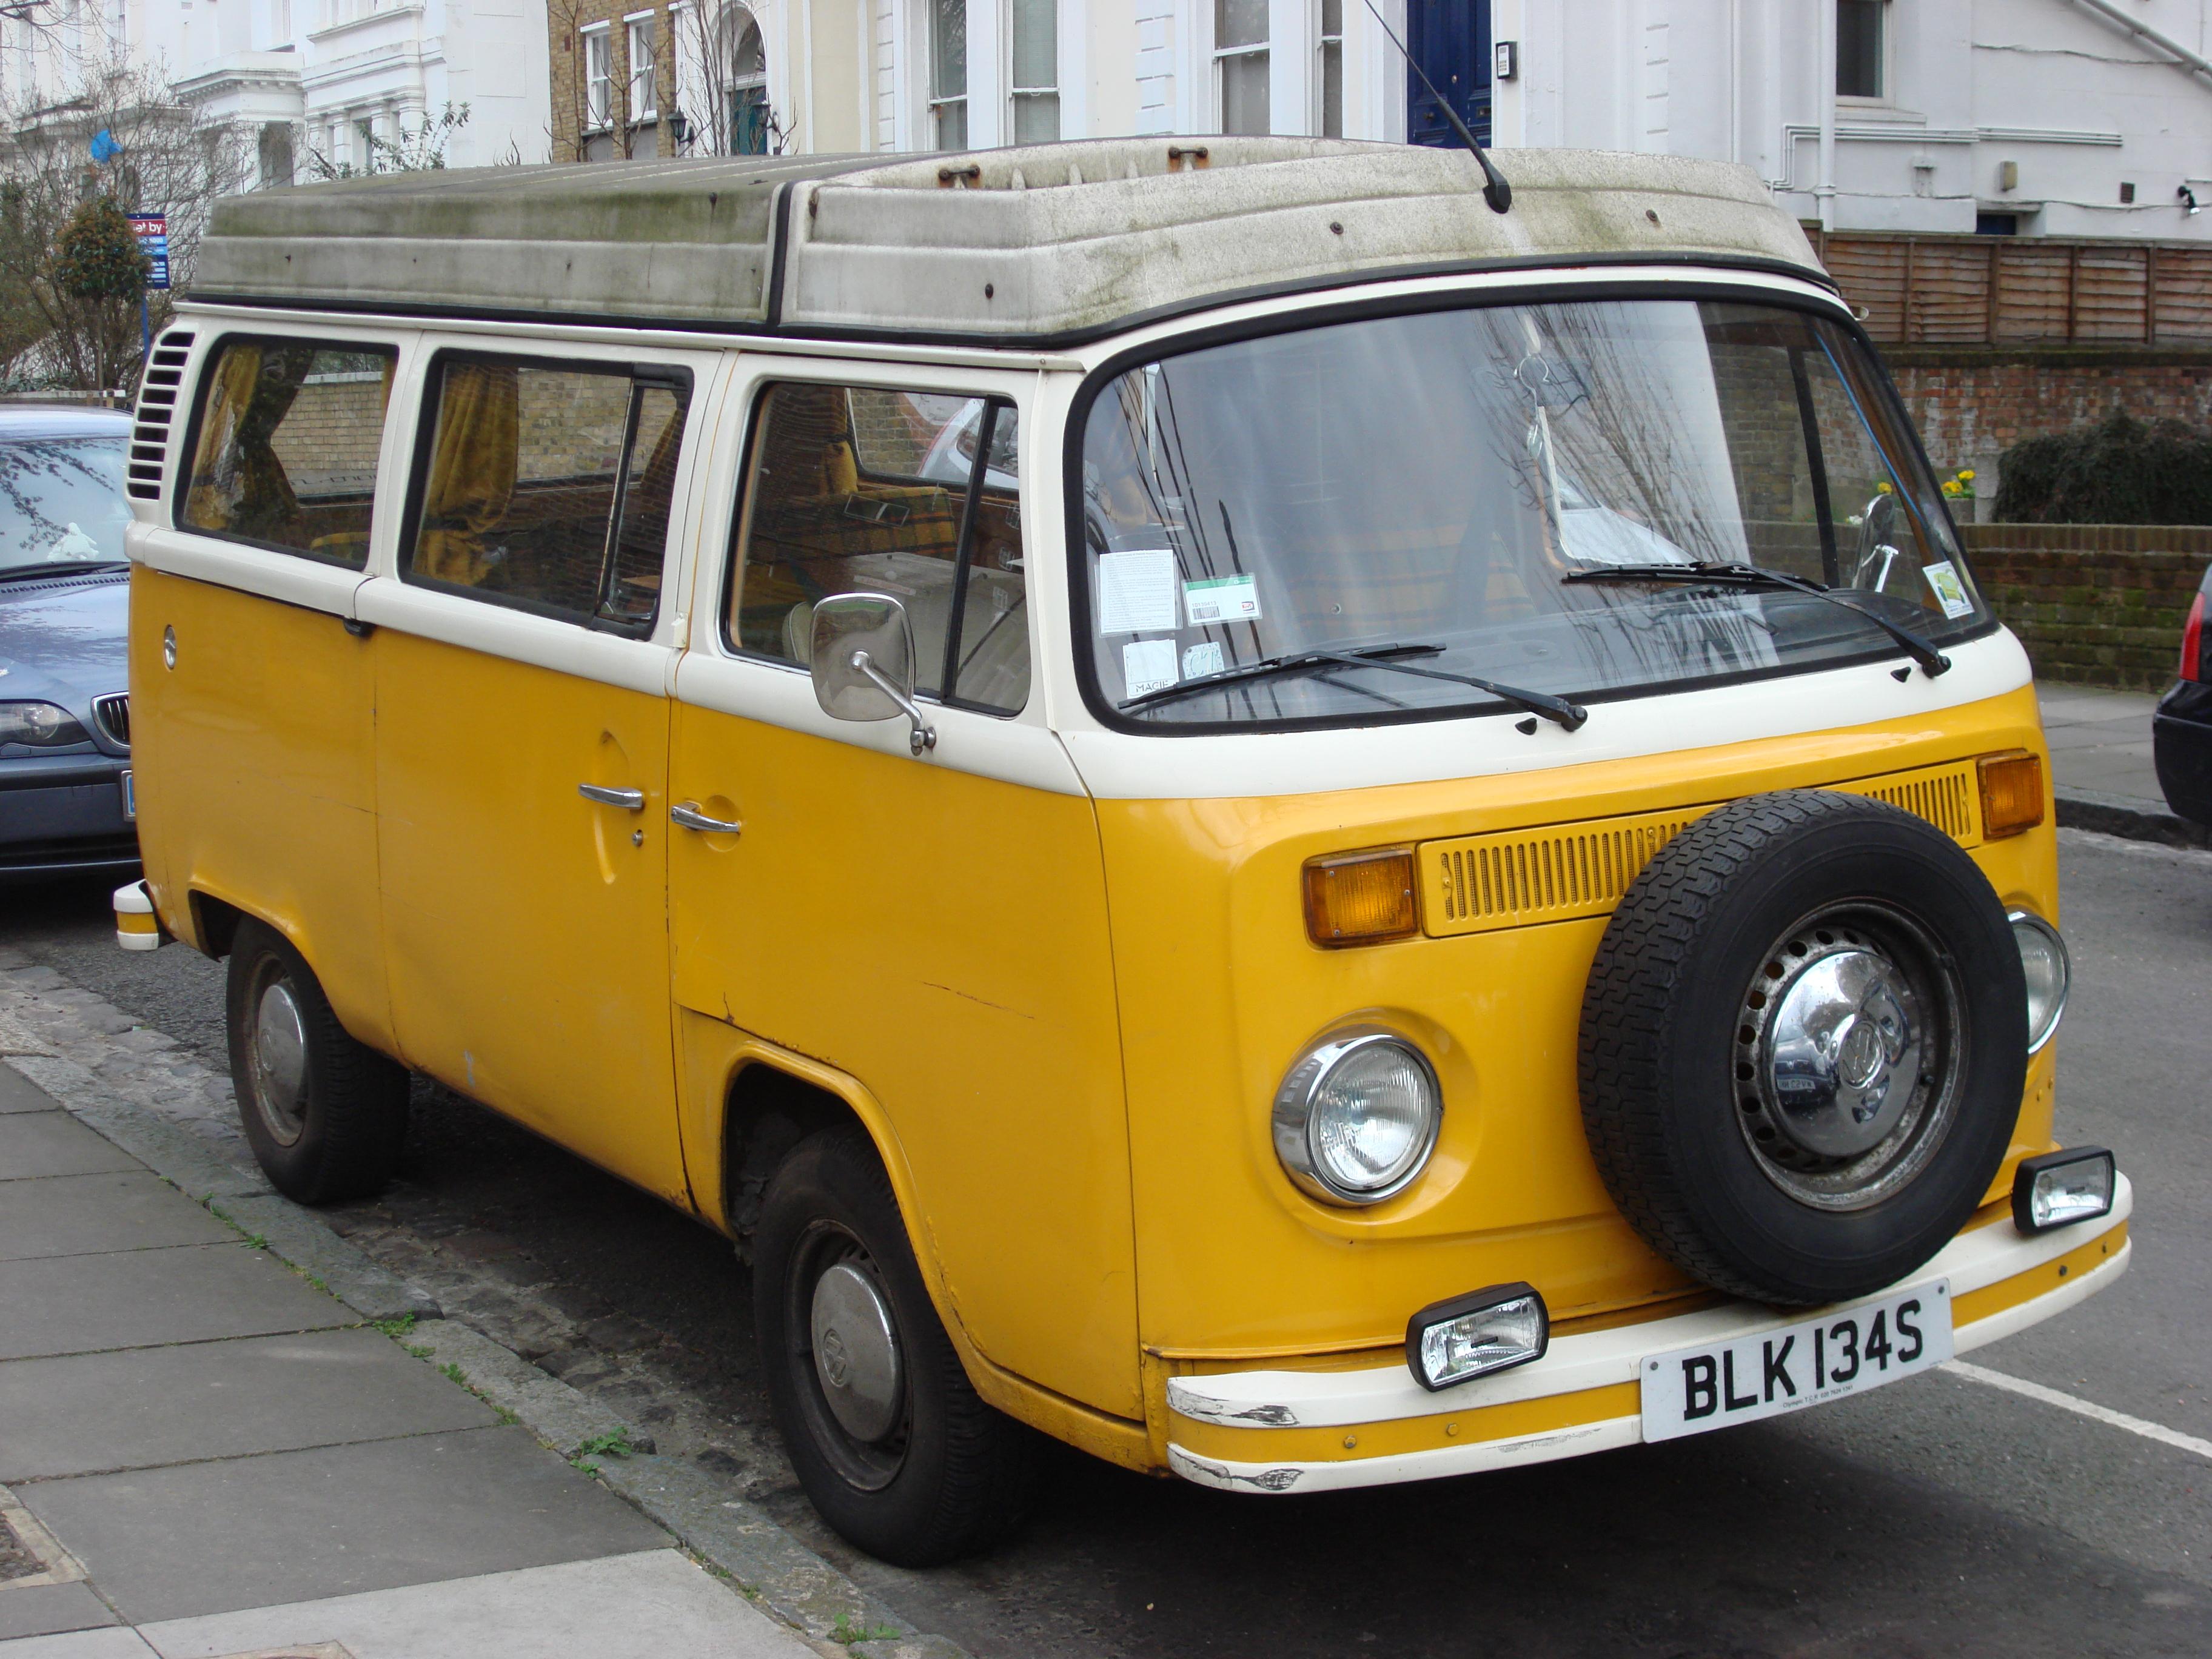 Vw Bug Camper >> File:VW T2 campervan.jpg - Wikimedia Commons